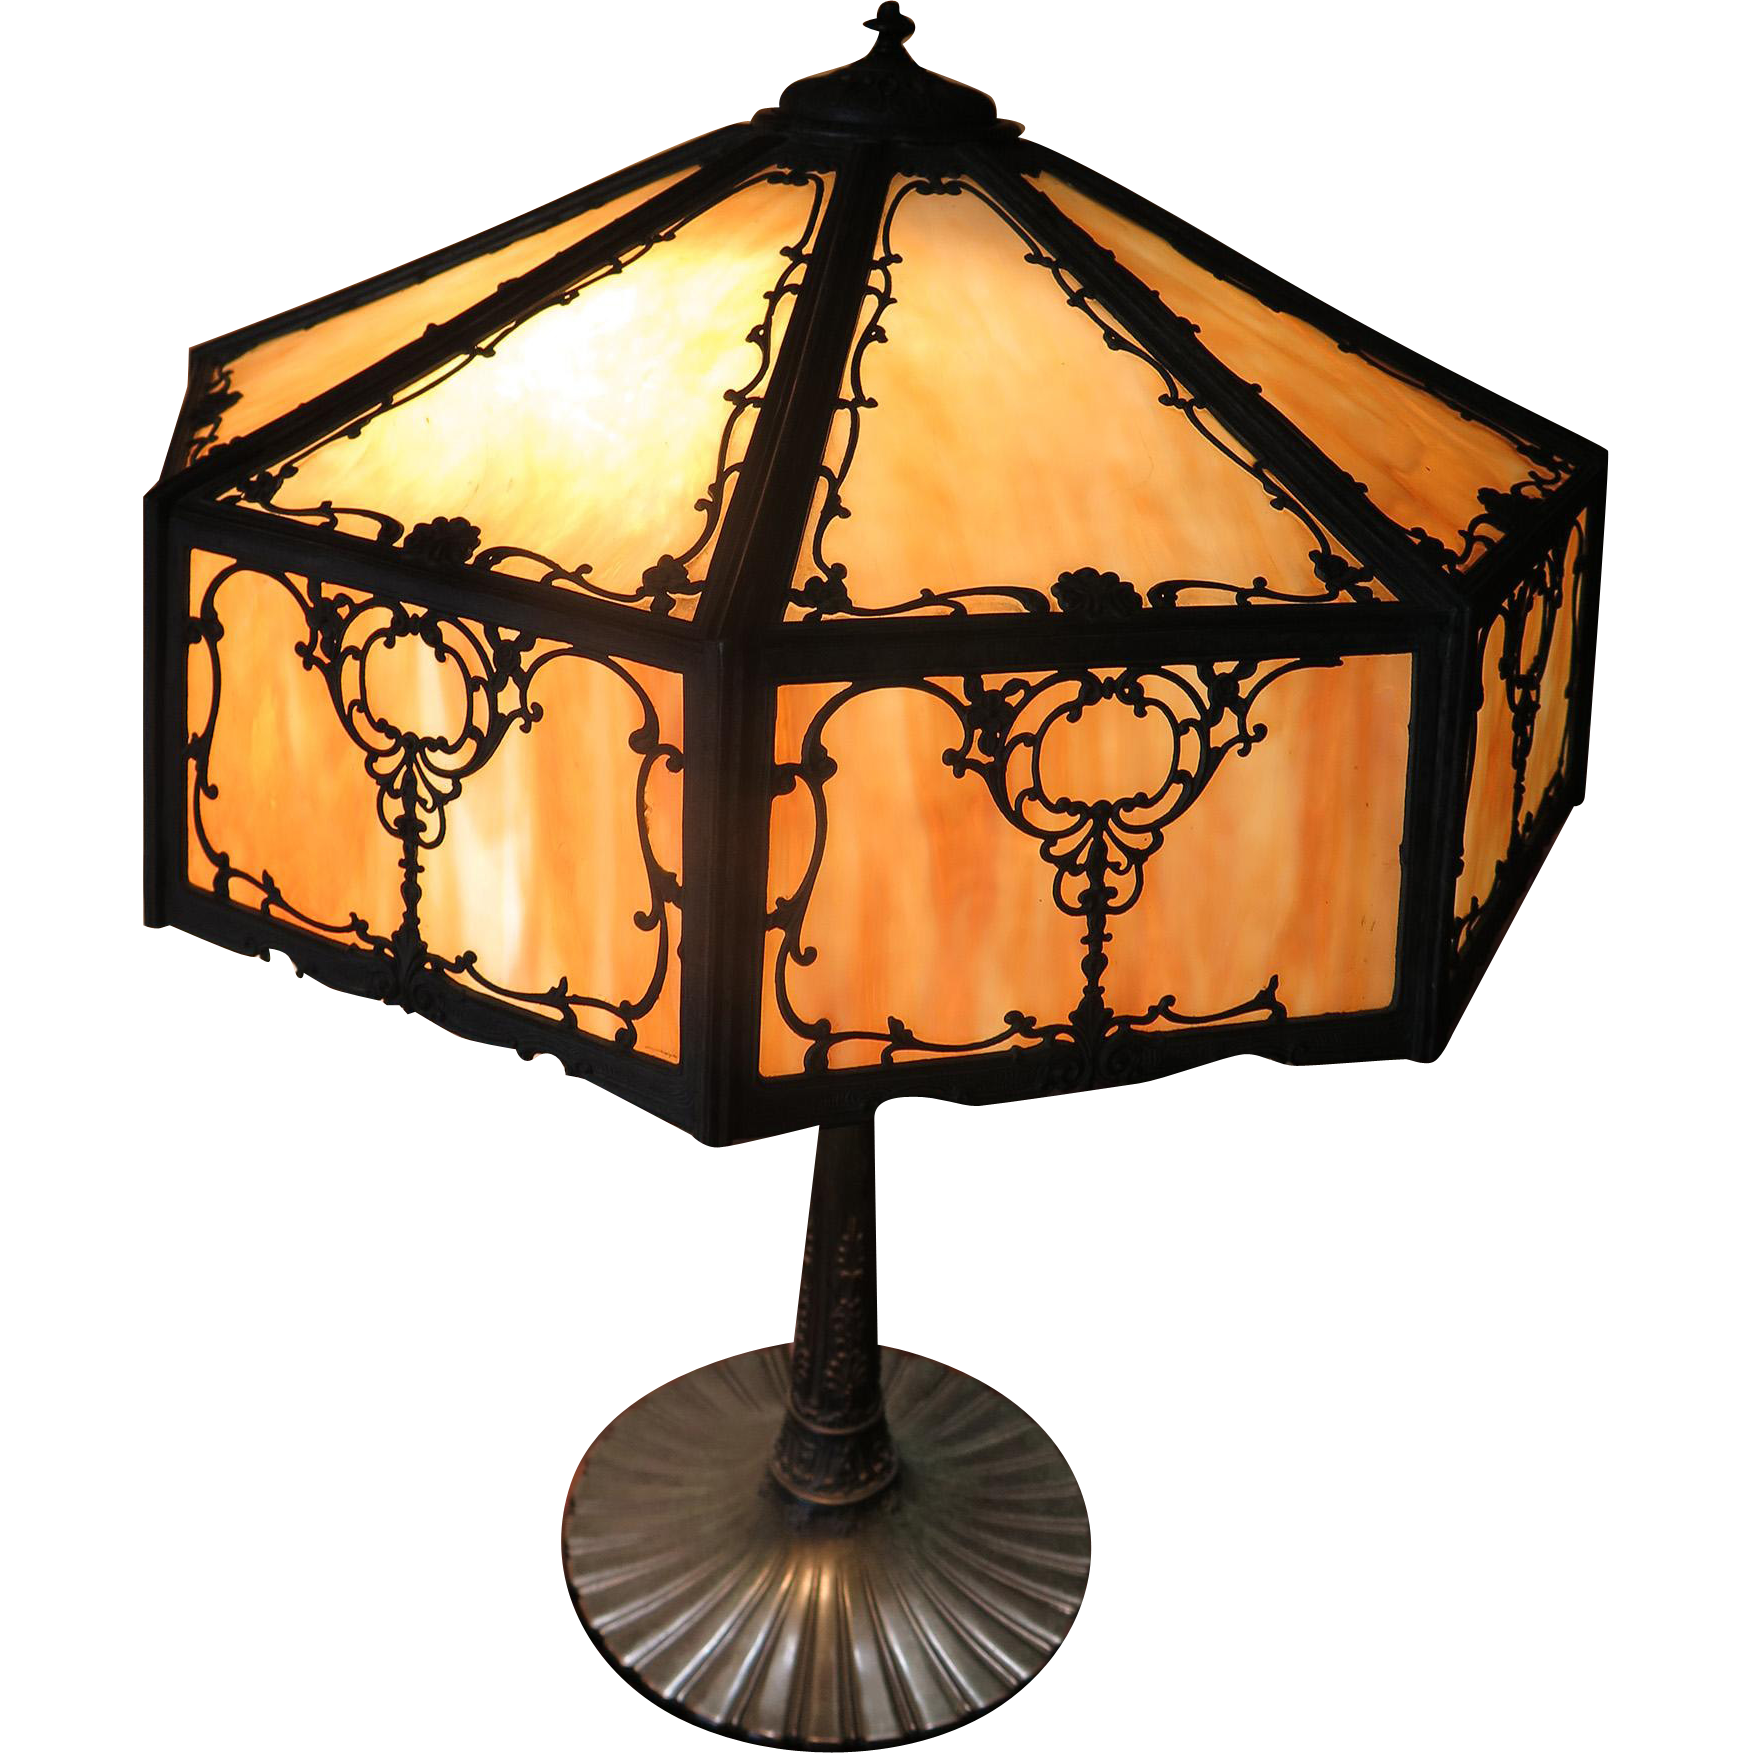 Wilkinson Filigree and Caramel Slag Panel Lamp